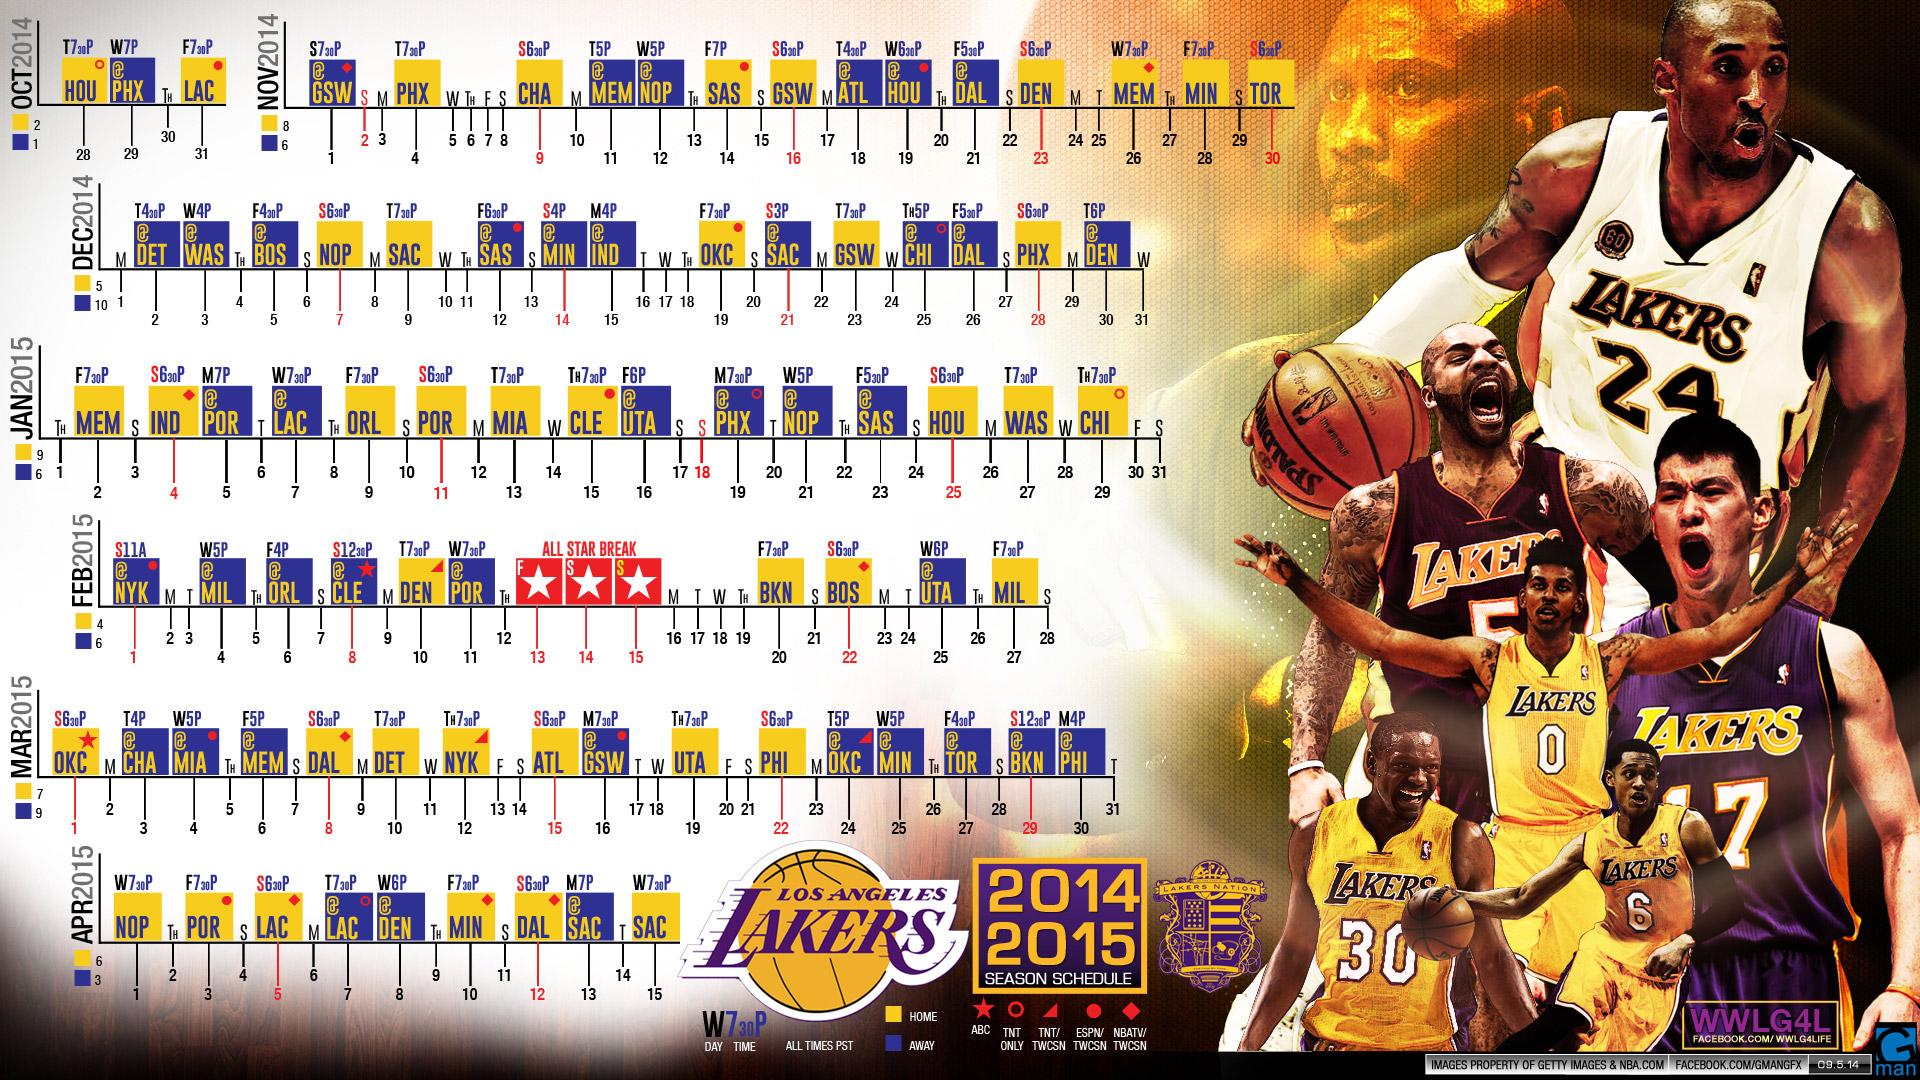 Free Download La Lakers 2014 2015 Schedule Wallpaper Basketball